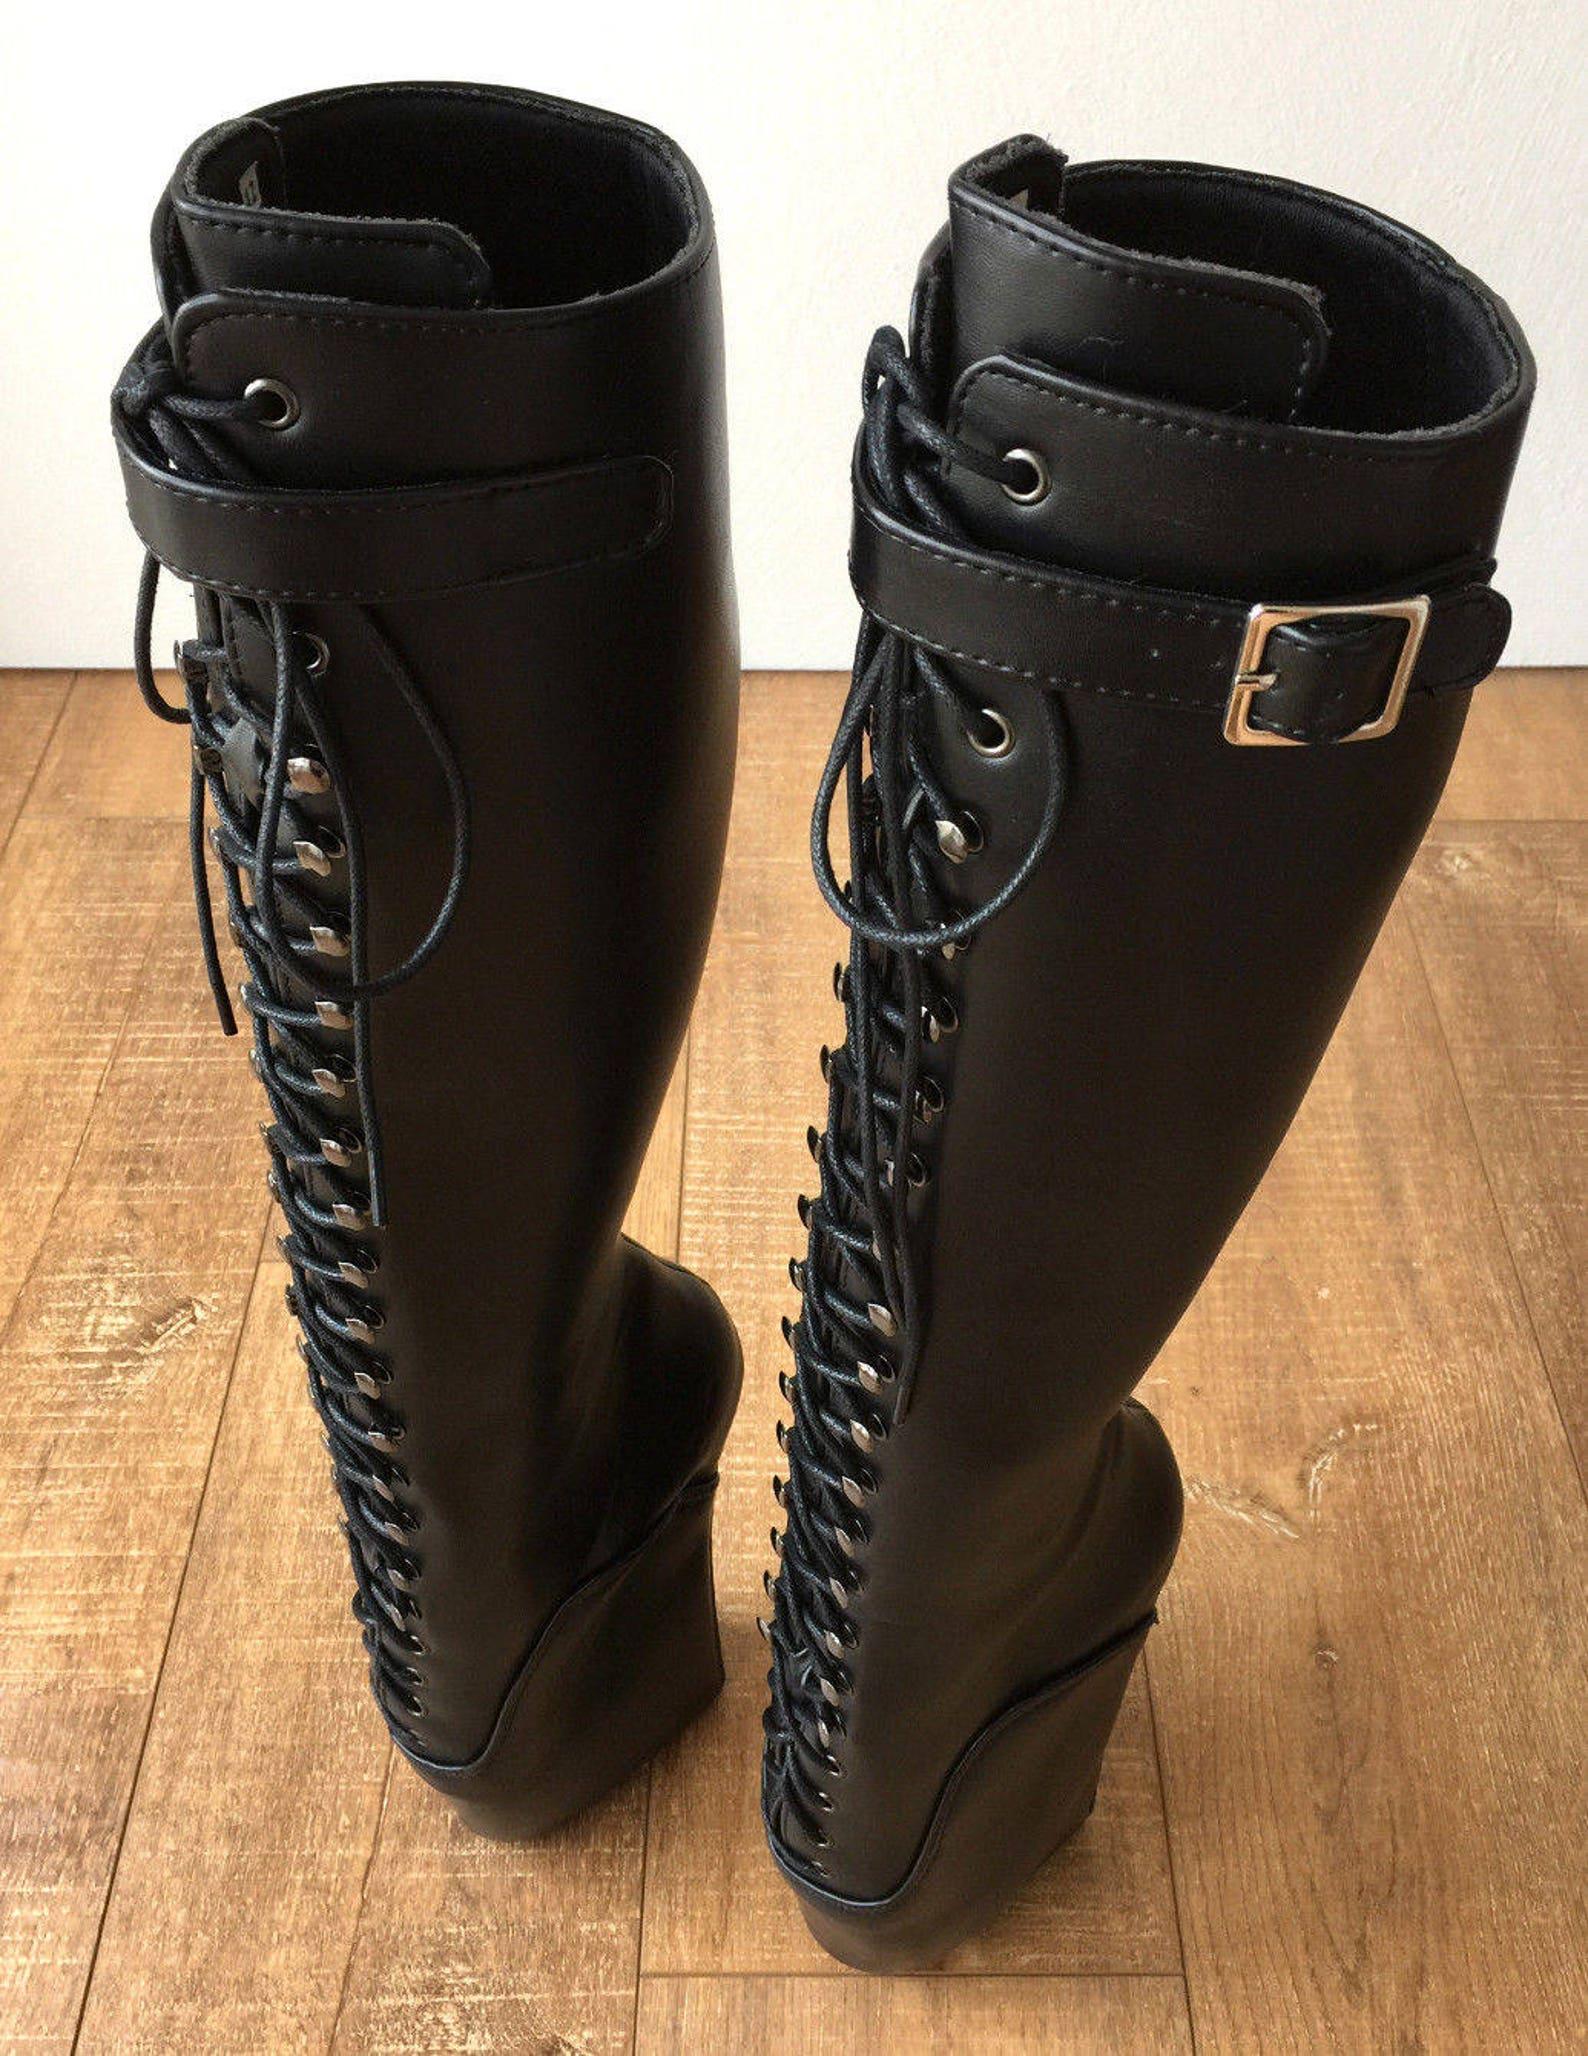 rtbu jason ballet wedge laceup knee hi boots hoof strap fetish dominatrix black